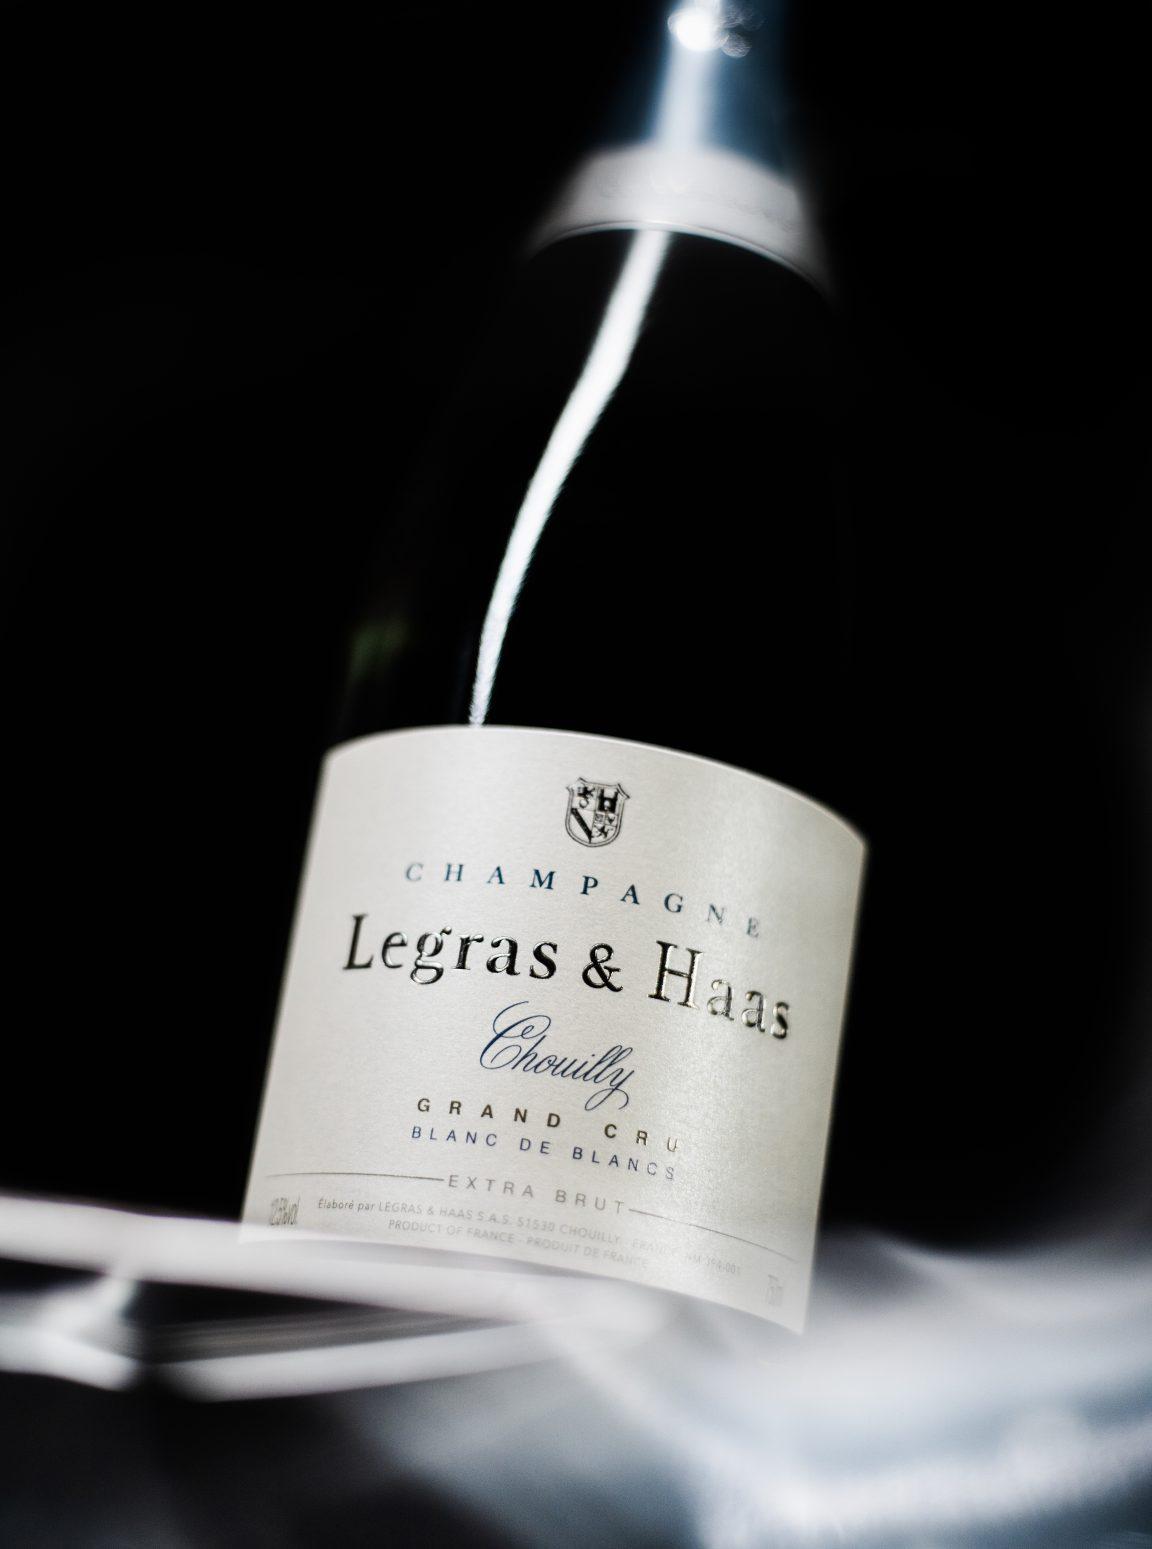 Blanc de Blancs Grand Cru Extra Brut - Champagne Legras & Haas